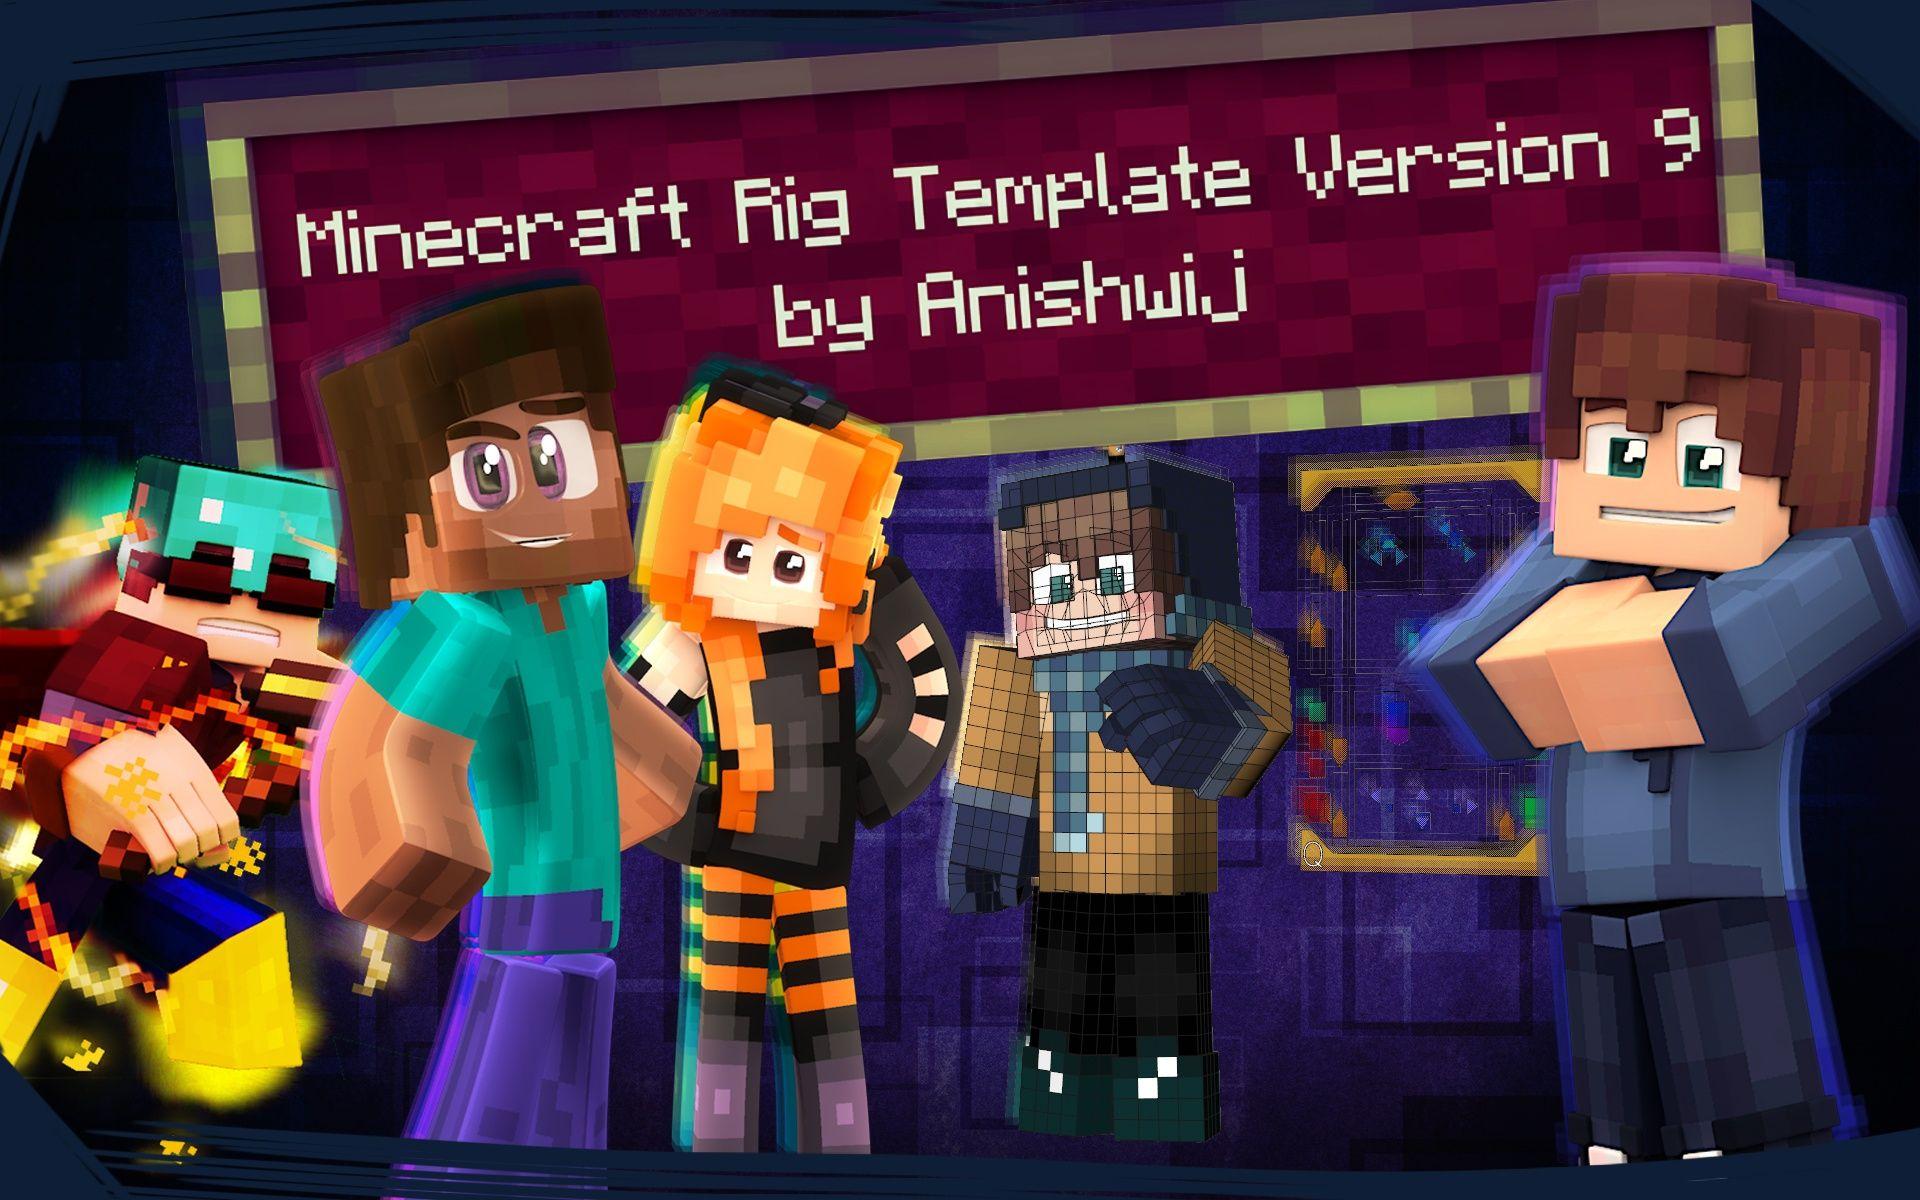 Cinema 4d Minecraft Rig Template Version 911 By Anishwij